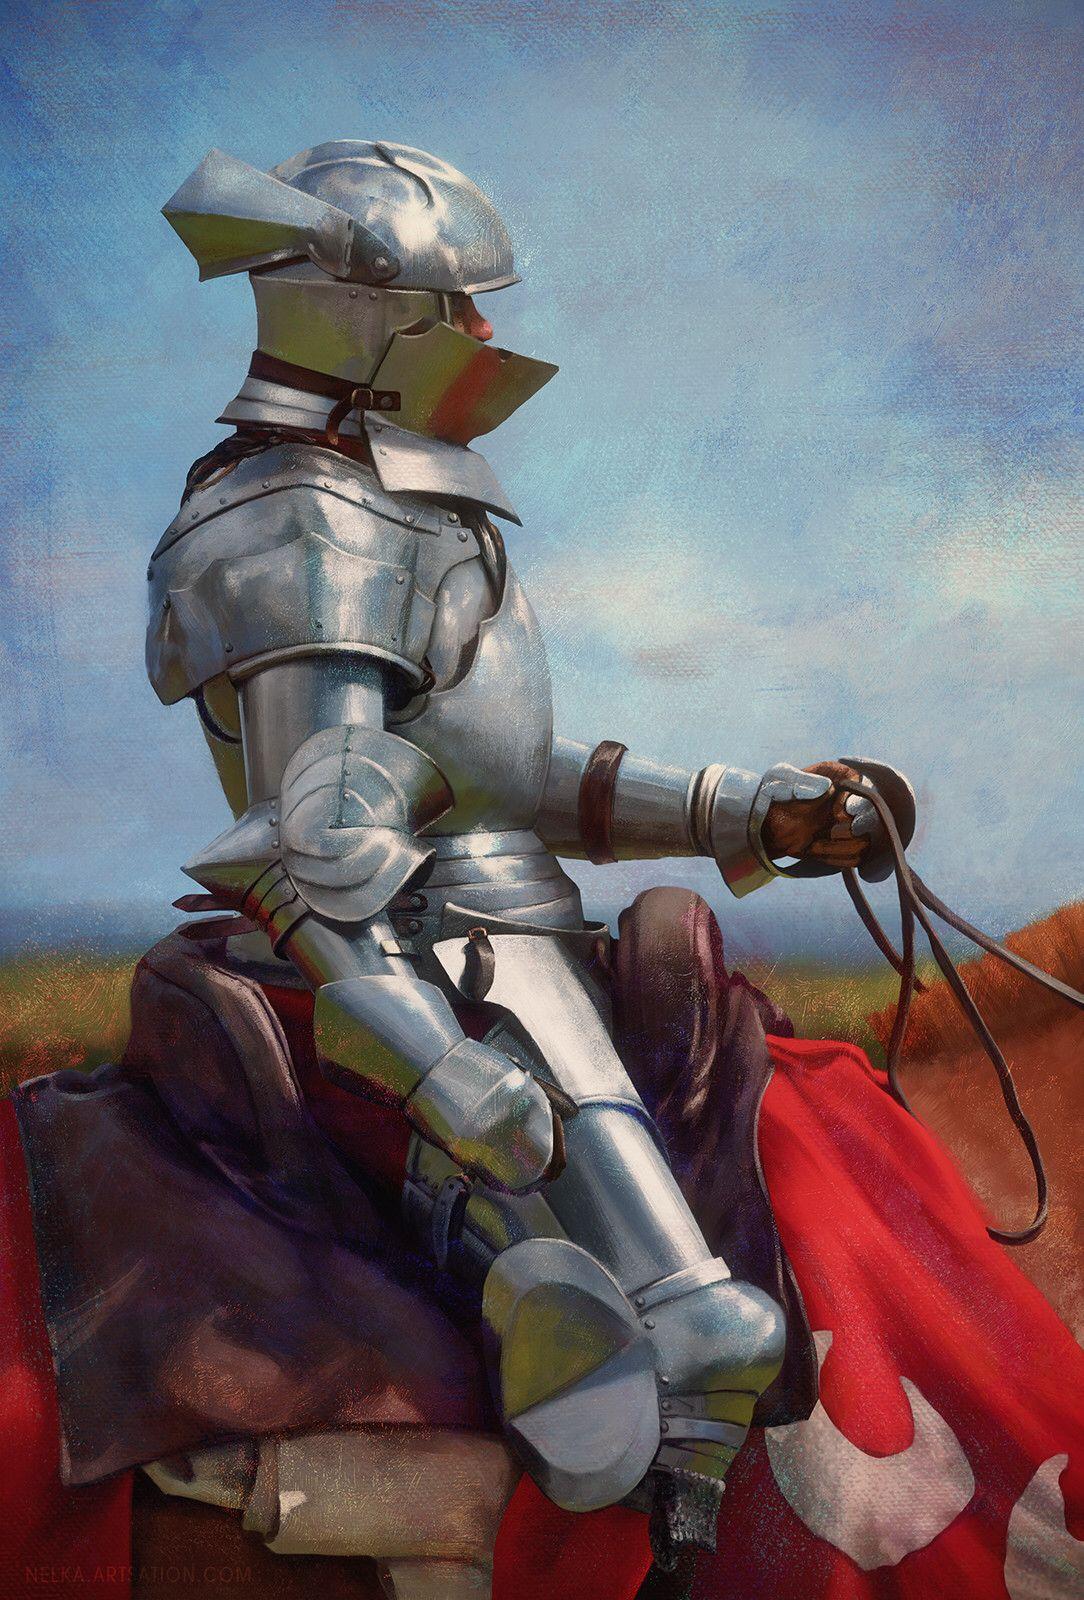 m Paladin Plate Helm Sword on Horseback midlvl -- Share via Artstation iOS App, Artstation © 2017